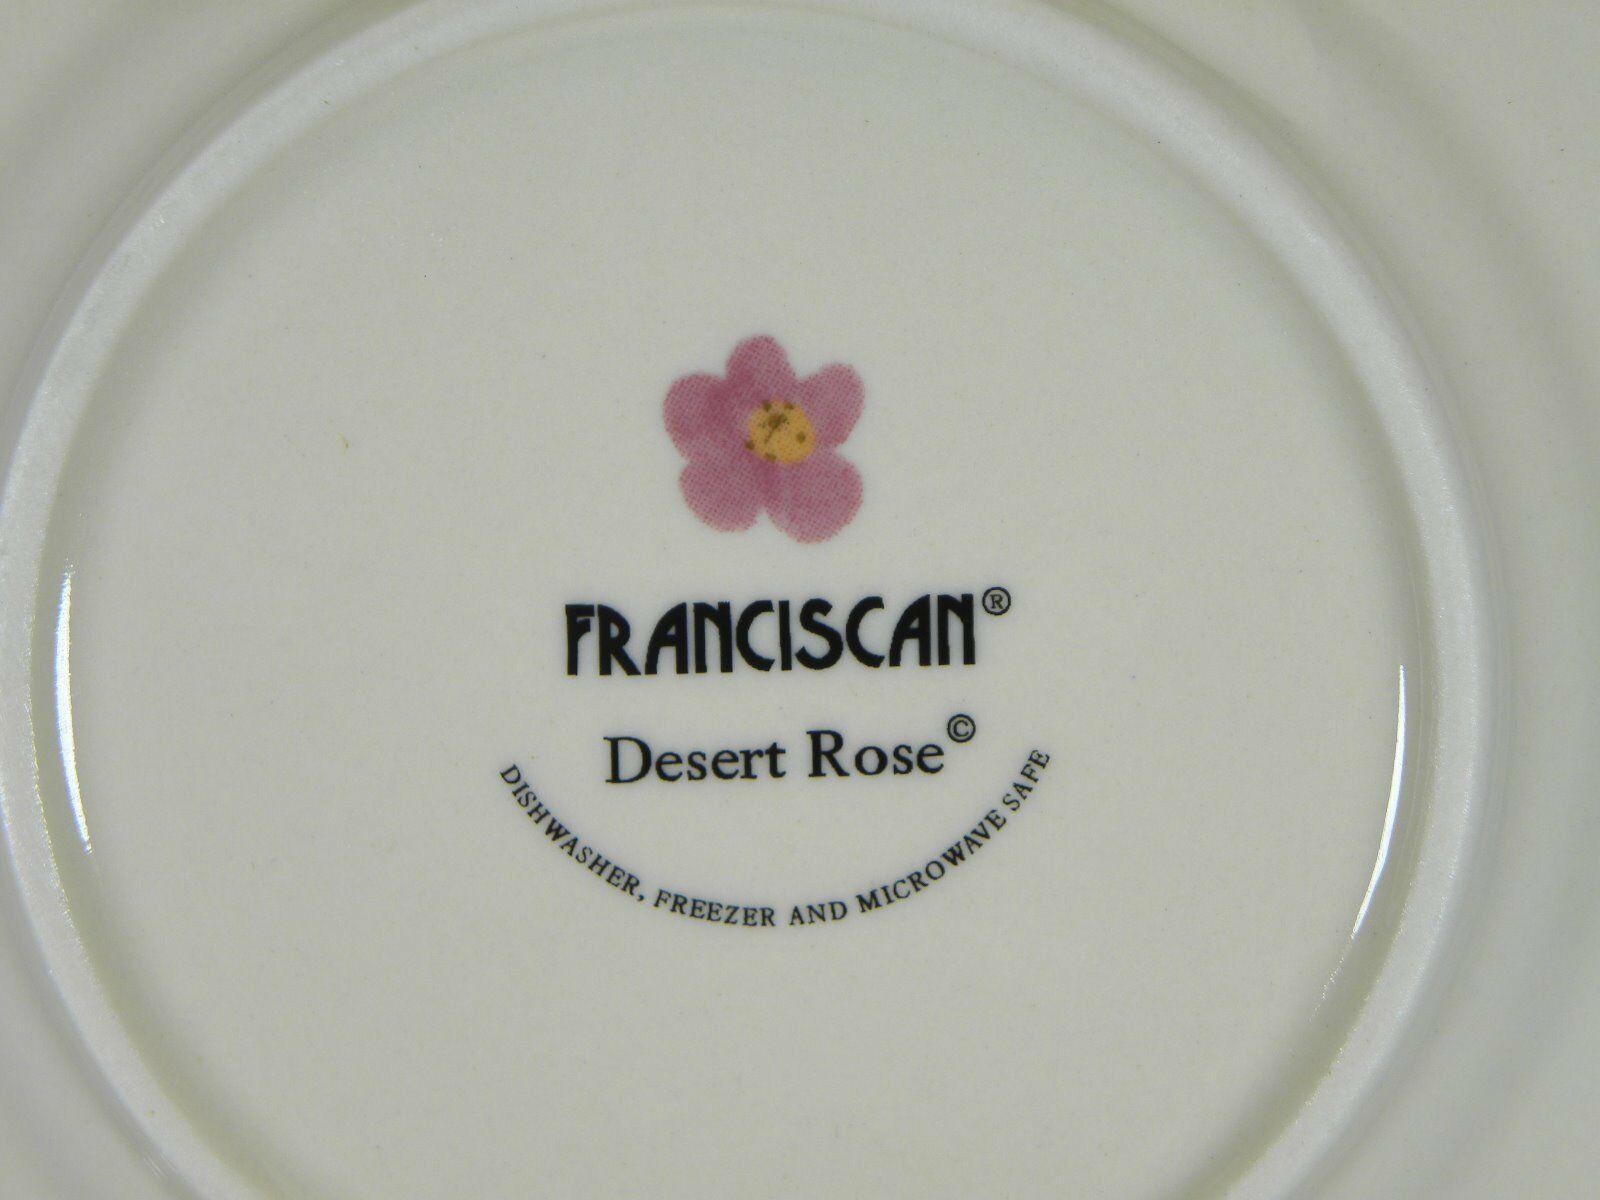 Franciscan Desert Rose Bread & Butter Plates Set of 12 BRAND NEW PRODUCTION